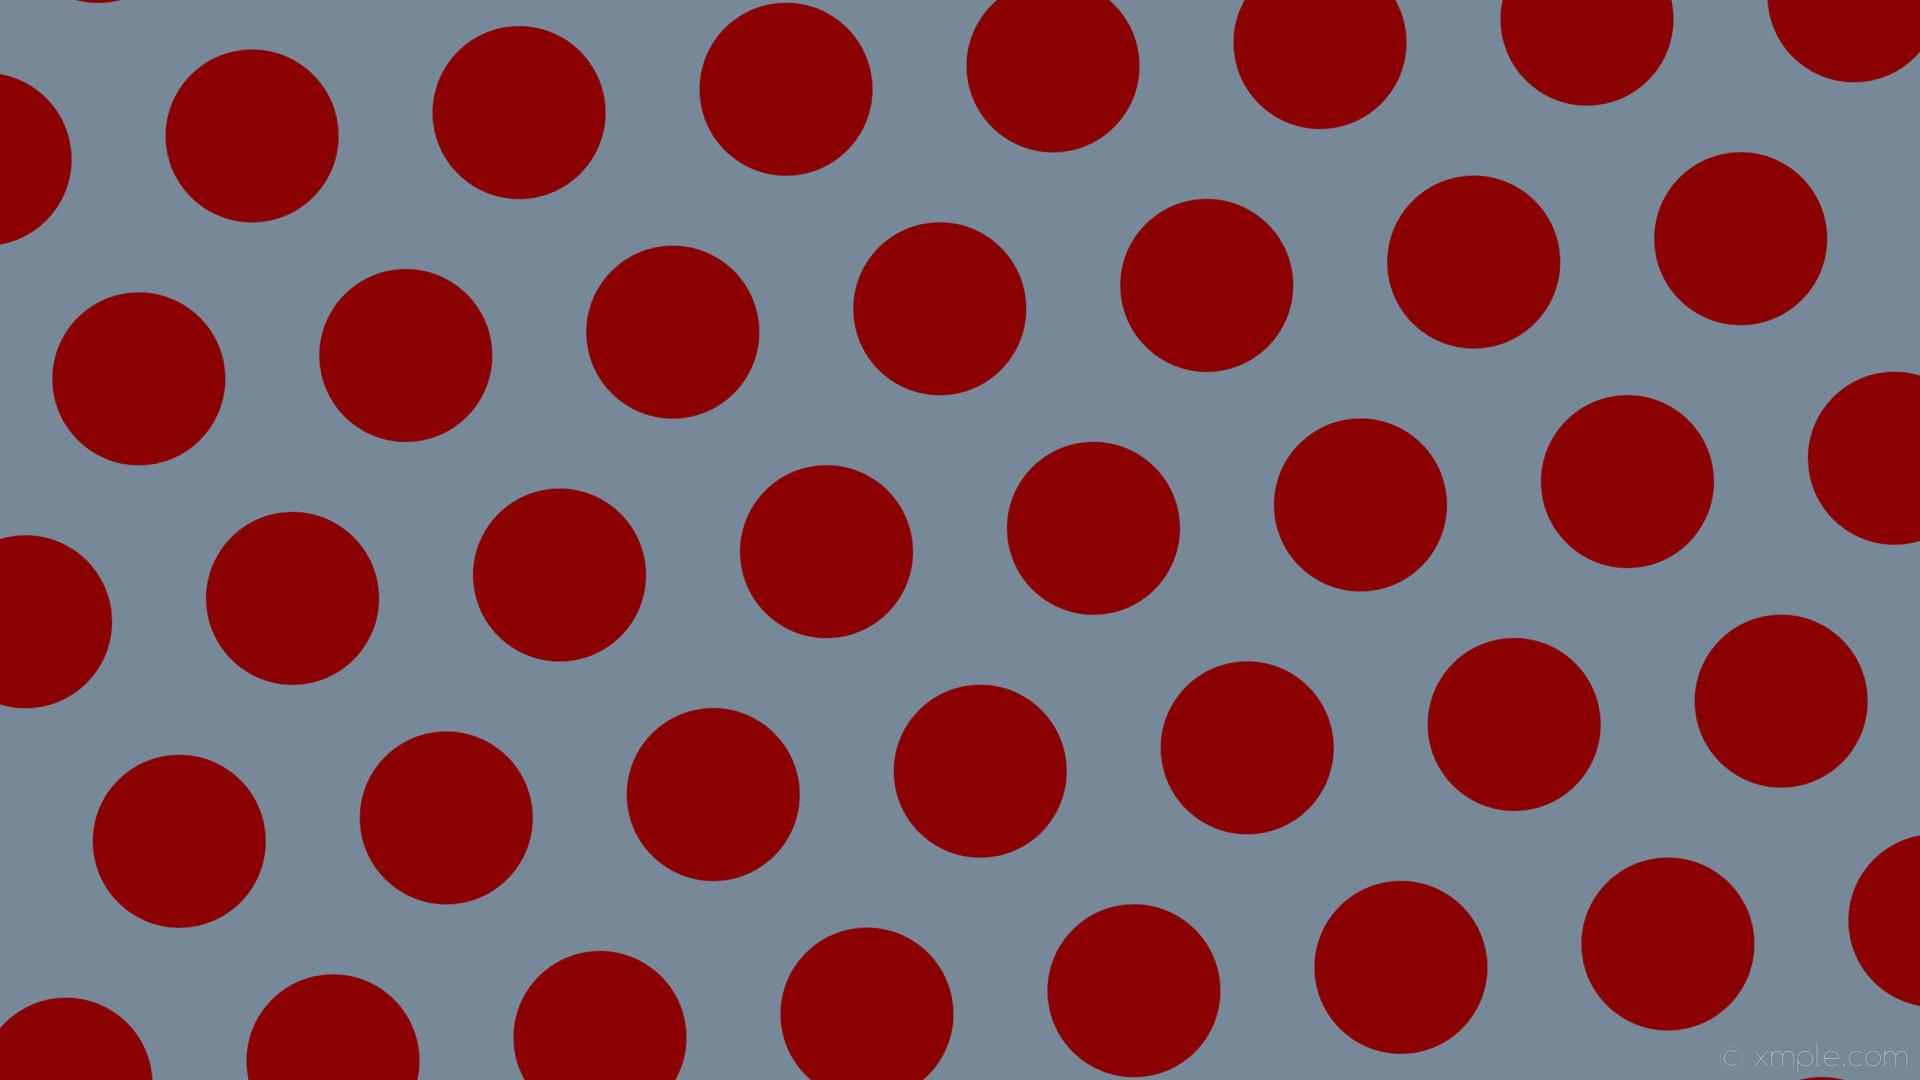 wallpaper red polka dots grey hexagon light slate gray dark red #778899  #8b0000 diagonal